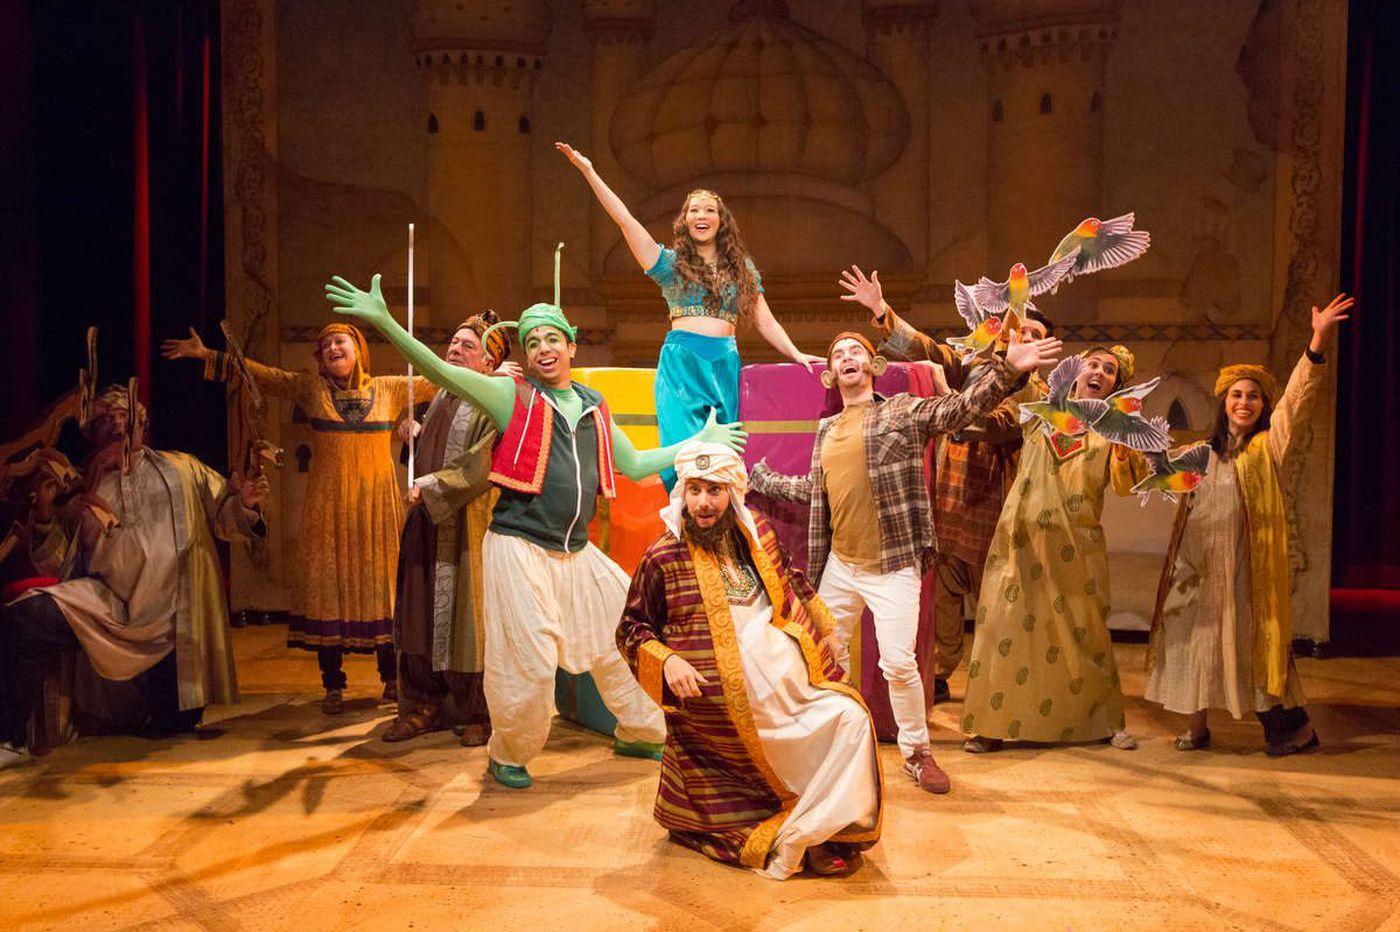 'Aladdin' at People's Light: Saving the world through silliness